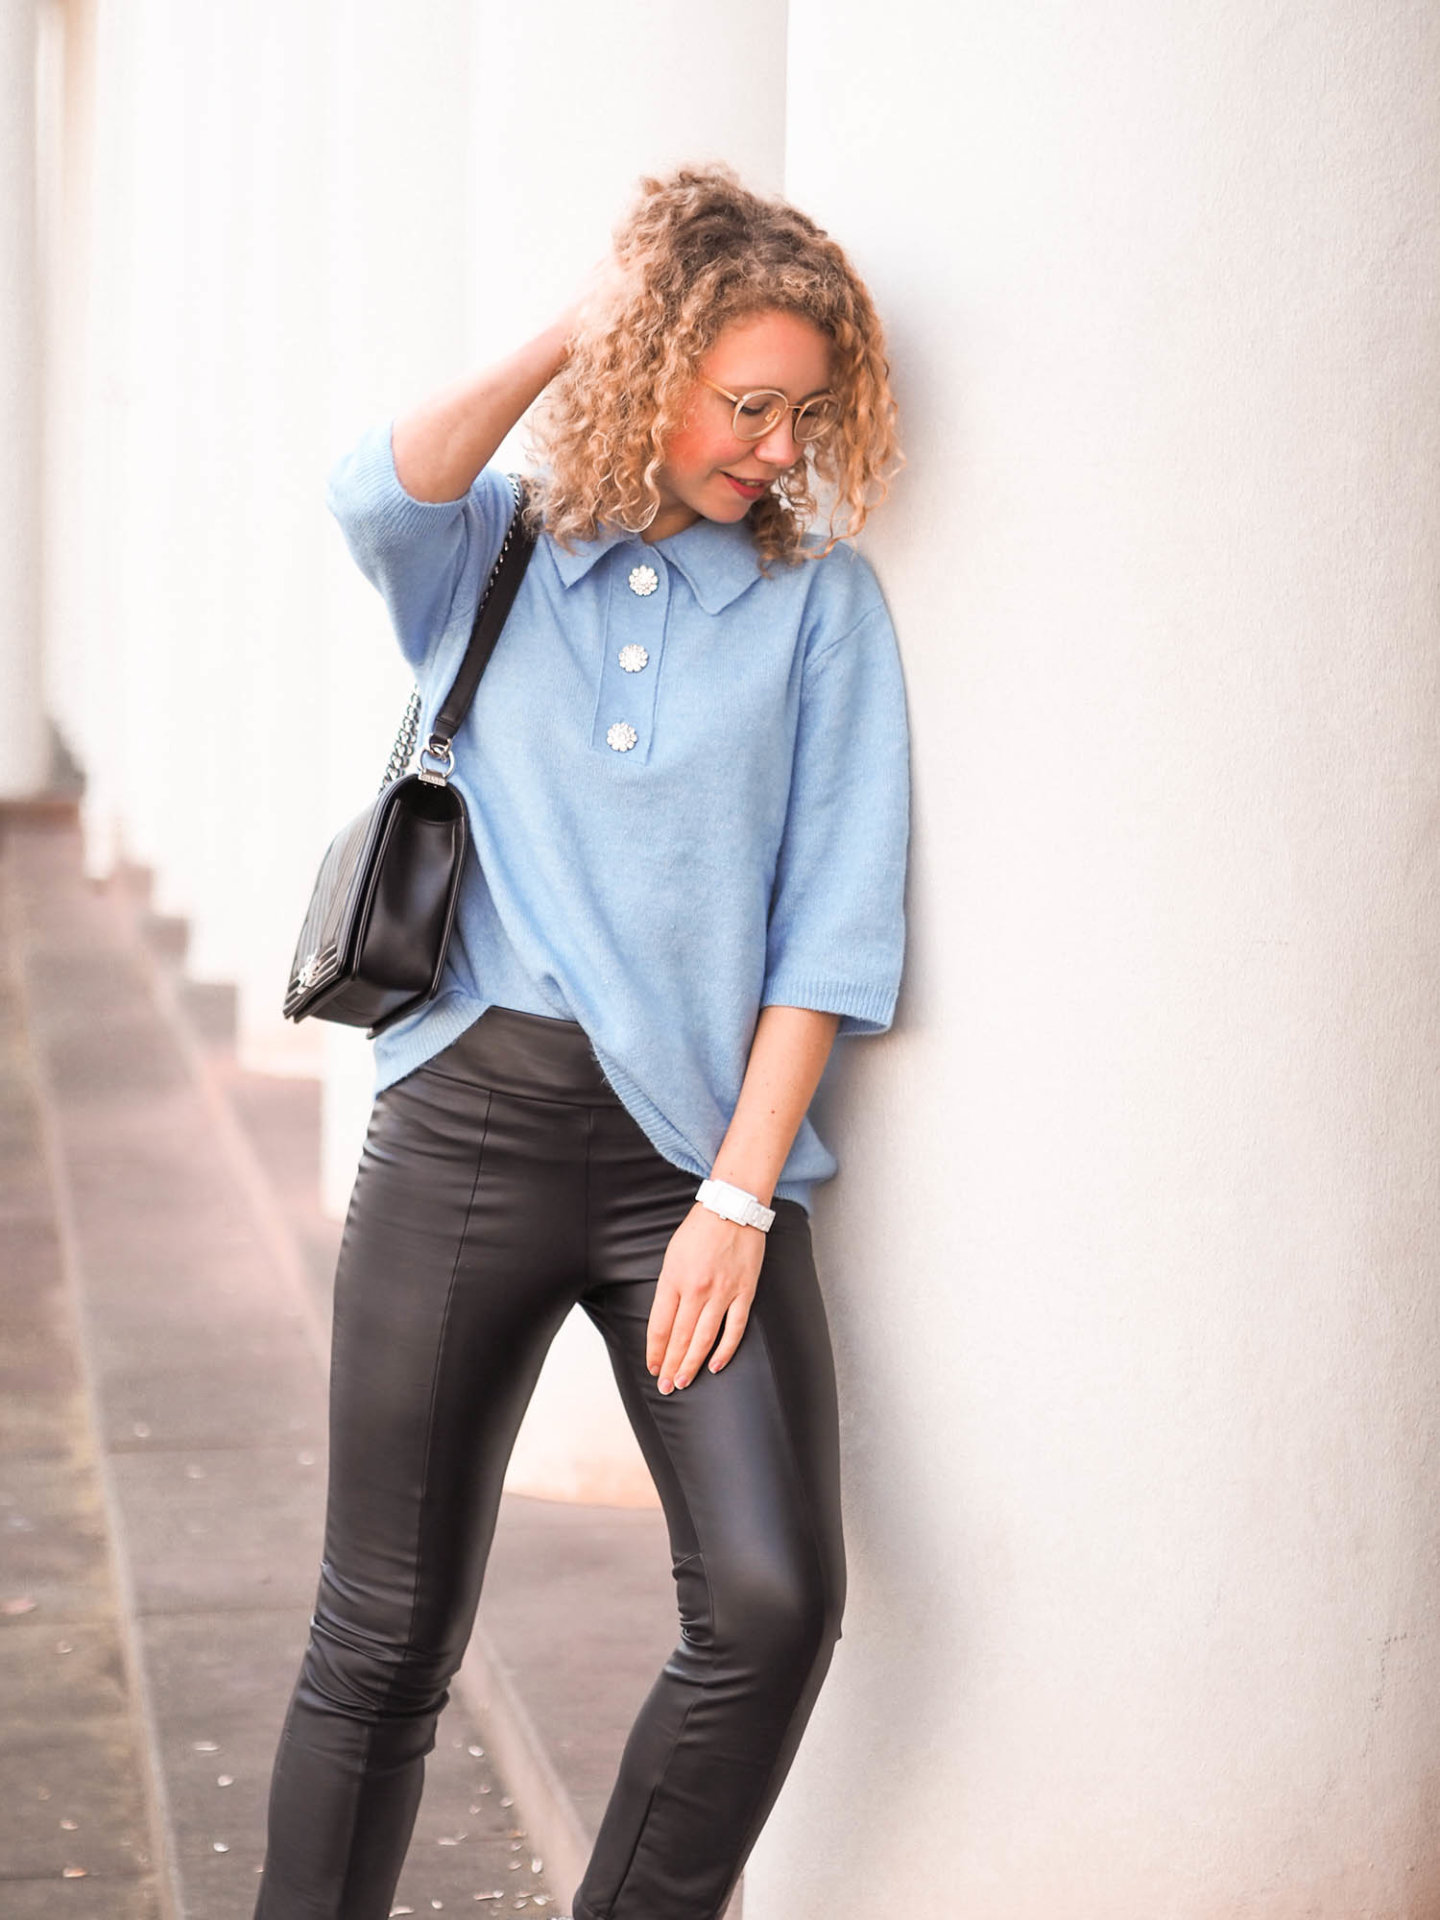 Kurzarm-Pullover und Lederleggings